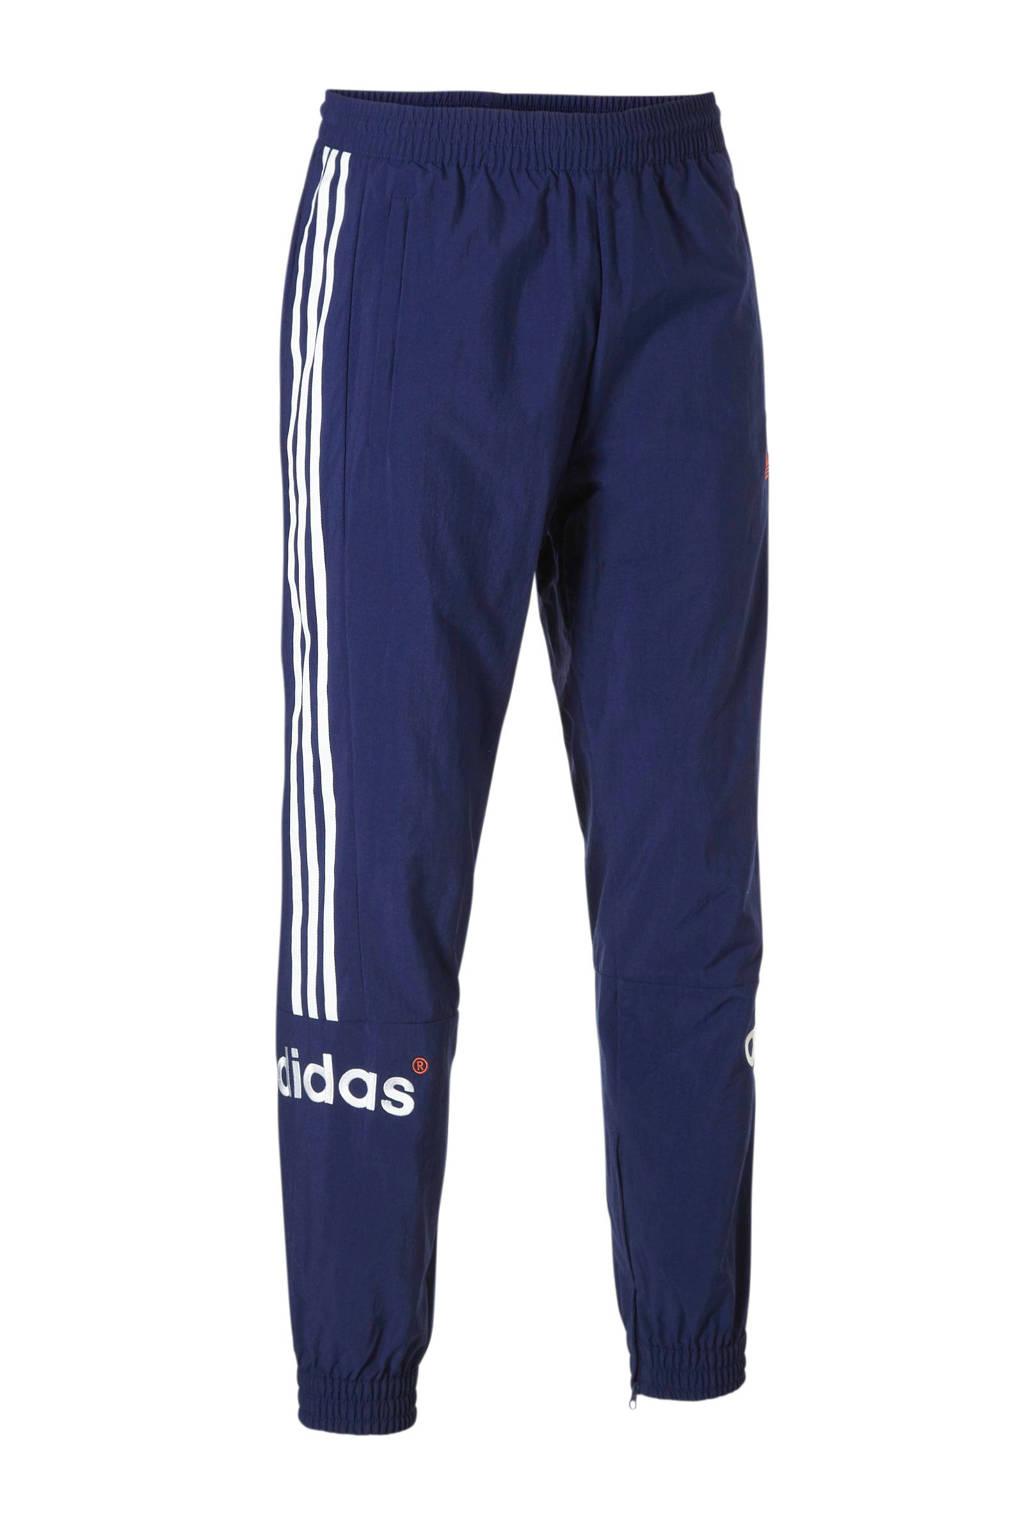 adidas originals trainingsbroek donkerblauw, Donkerblauw/wit